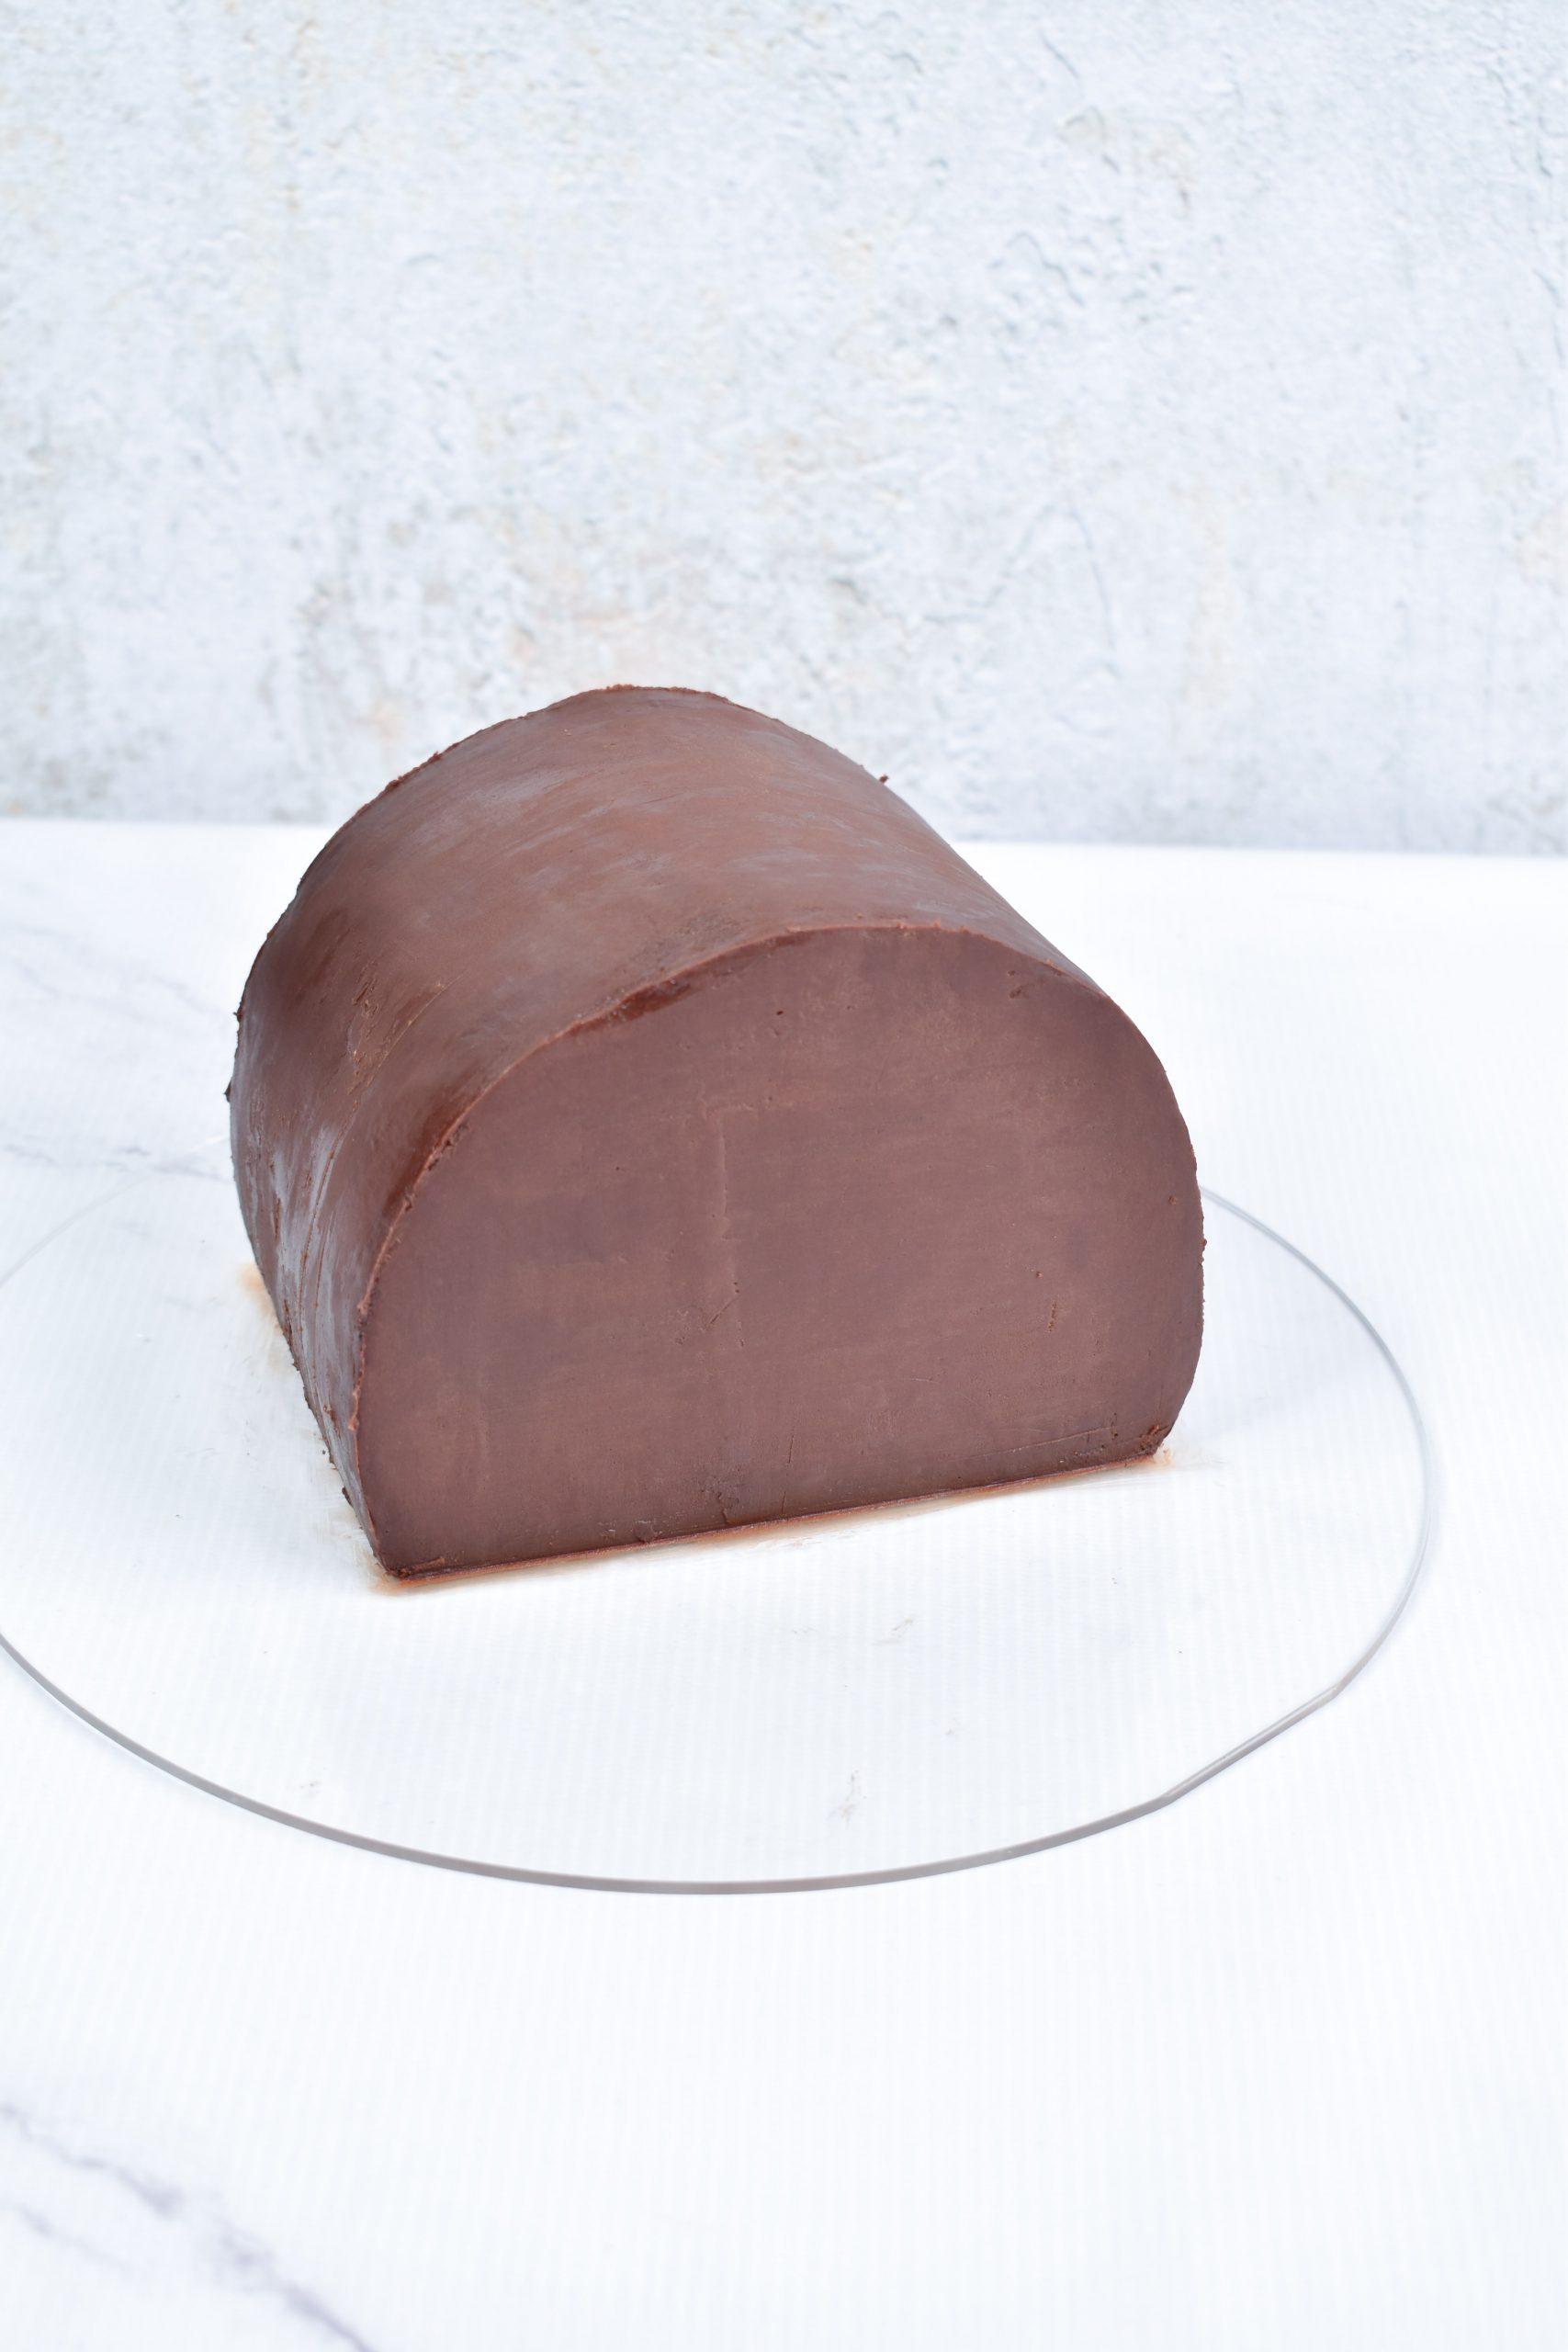 Ganache the Cake